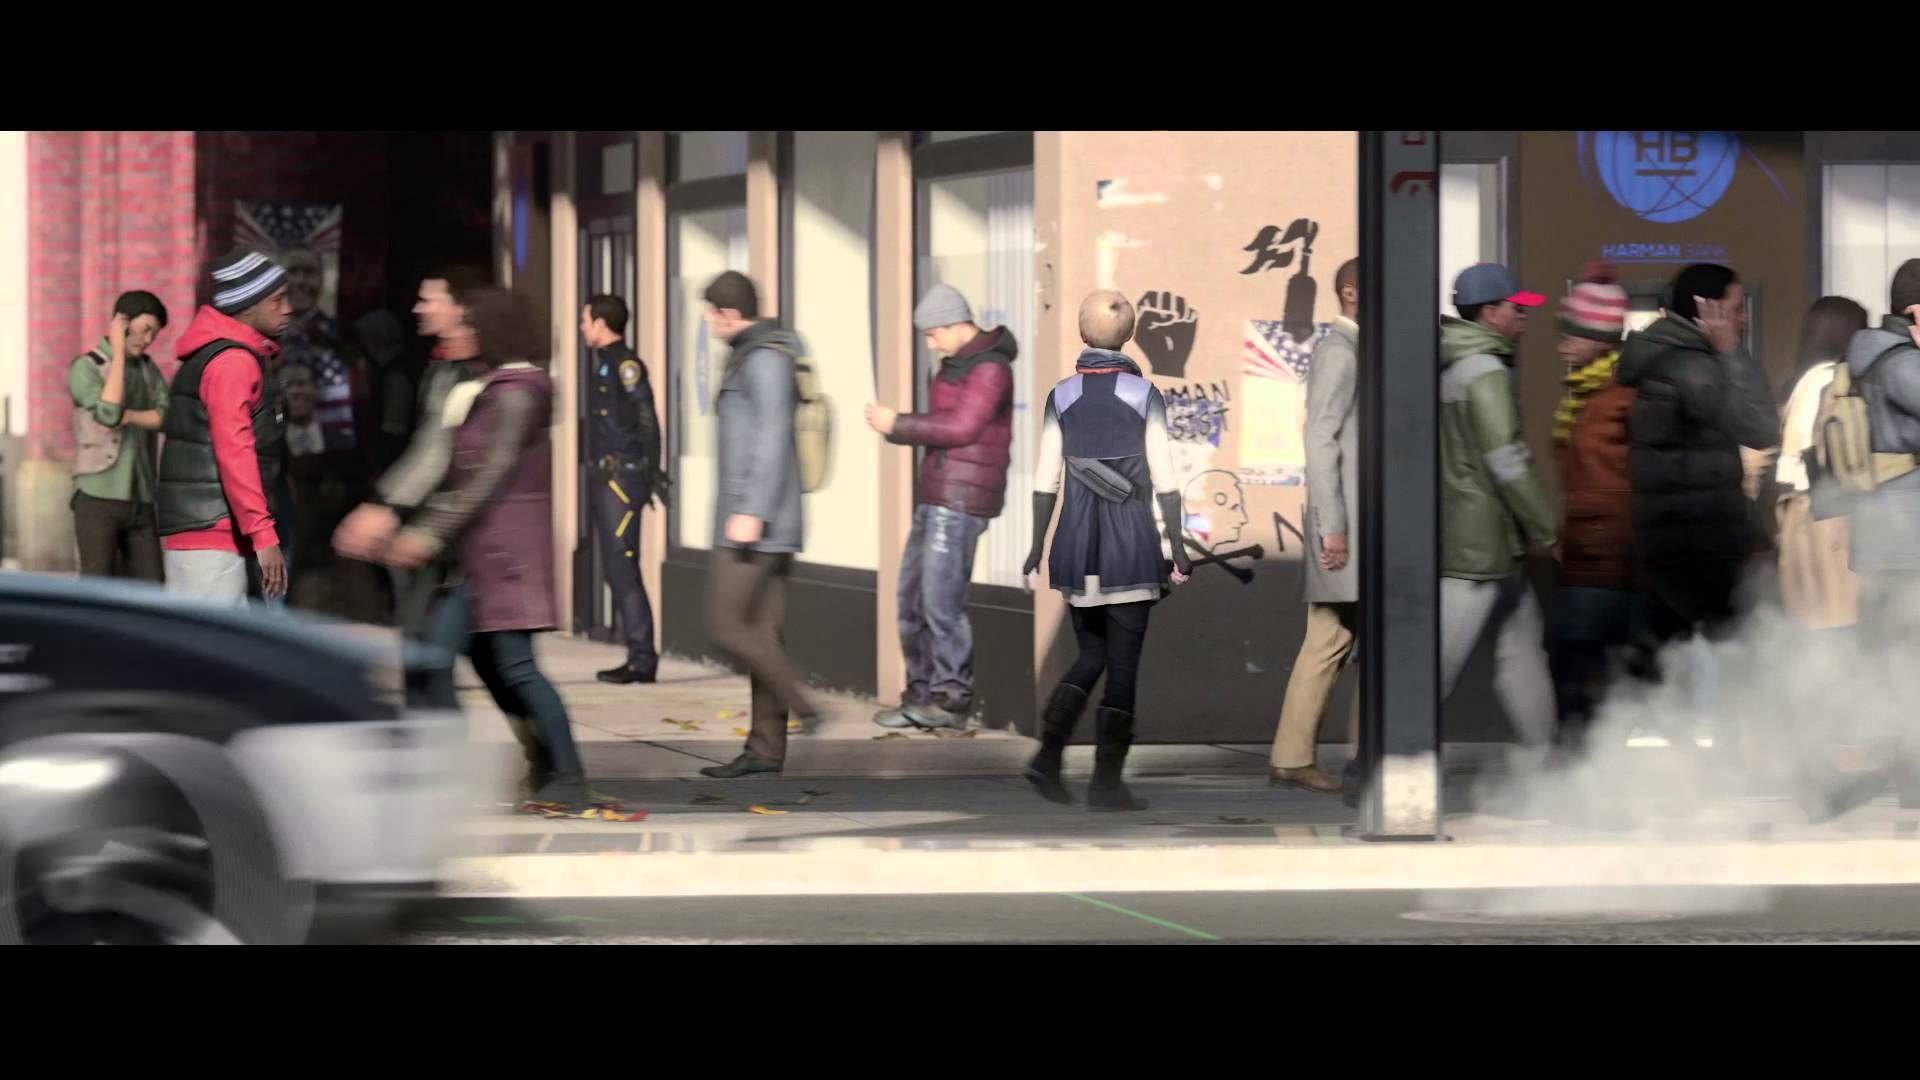 Detroit: Become Human Paris Games Week Trailer